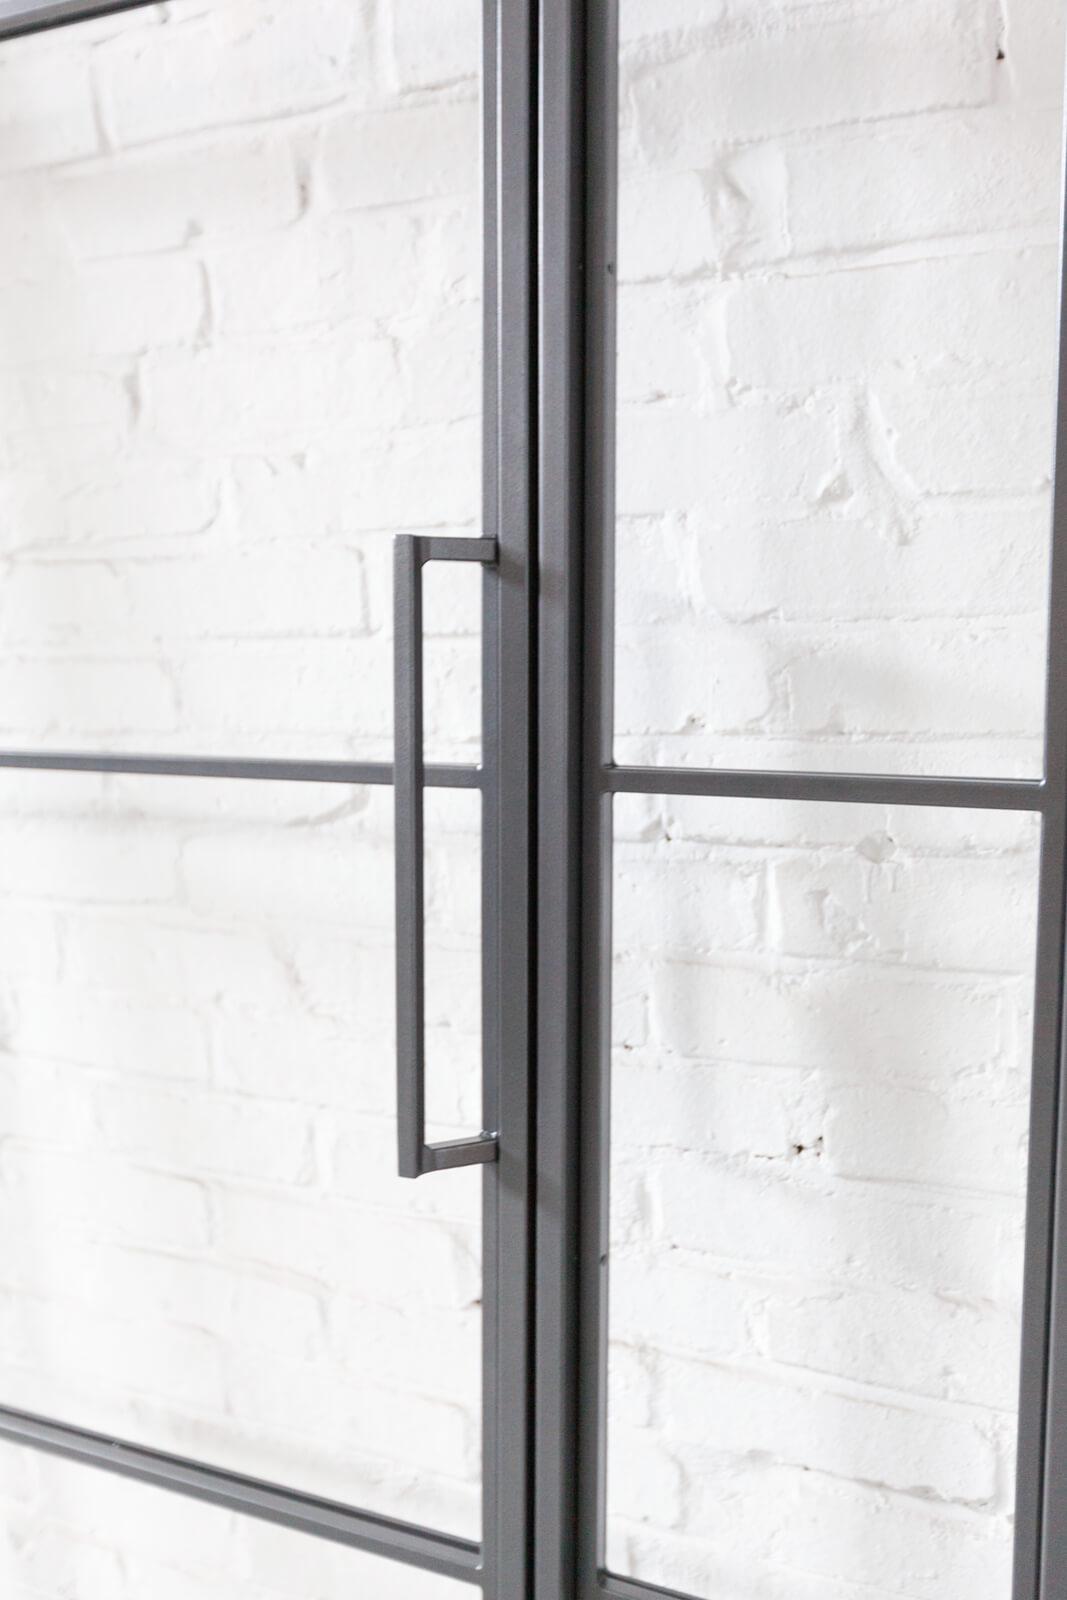 Loftstahl, N51E12 Stahl Loft Tür, Drehtür, Glasttür, Glastrennwand, Loftür, Windfang, Raumtrenner, Zimmertür, Stahltür, Glastür, Steeldoor, Industrial Door, Lofttür, Loftdoor